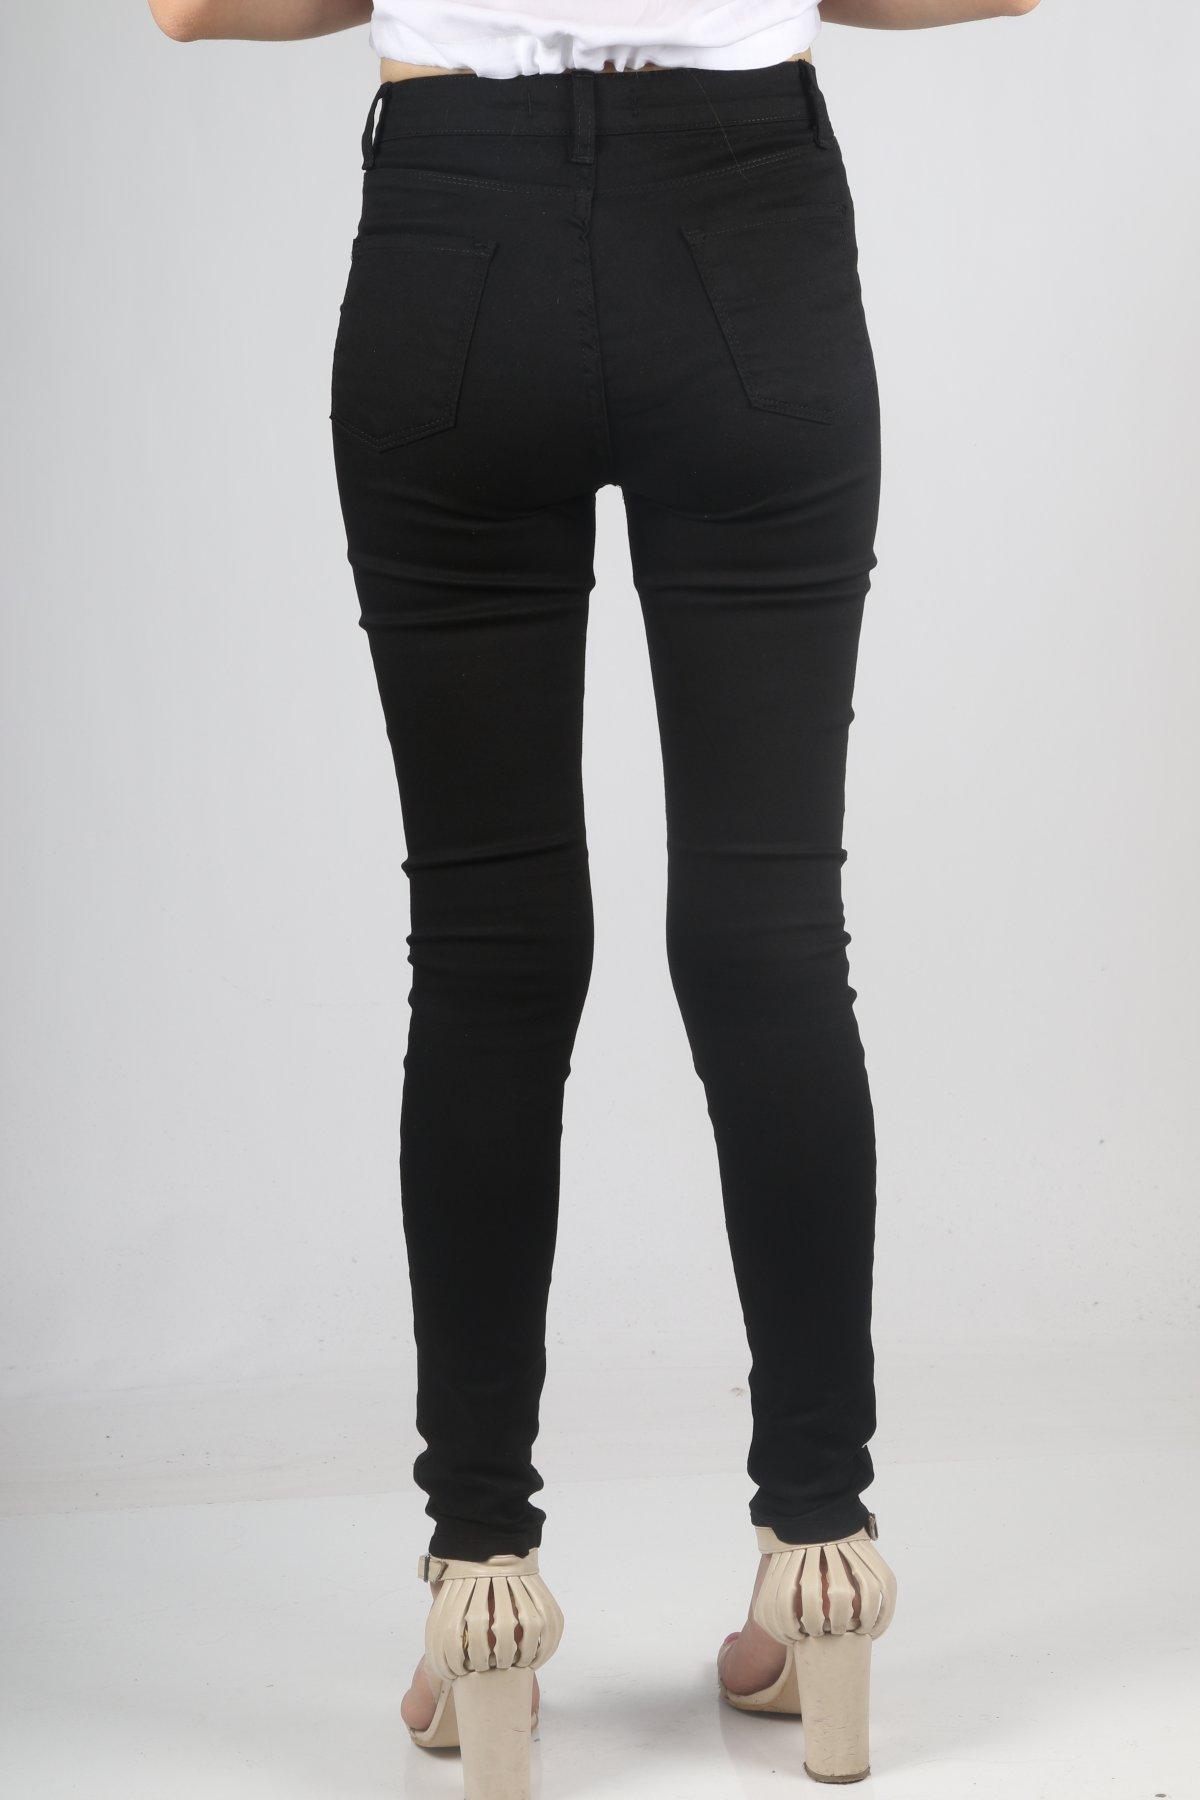 Keten Yüksekbel Pantolon